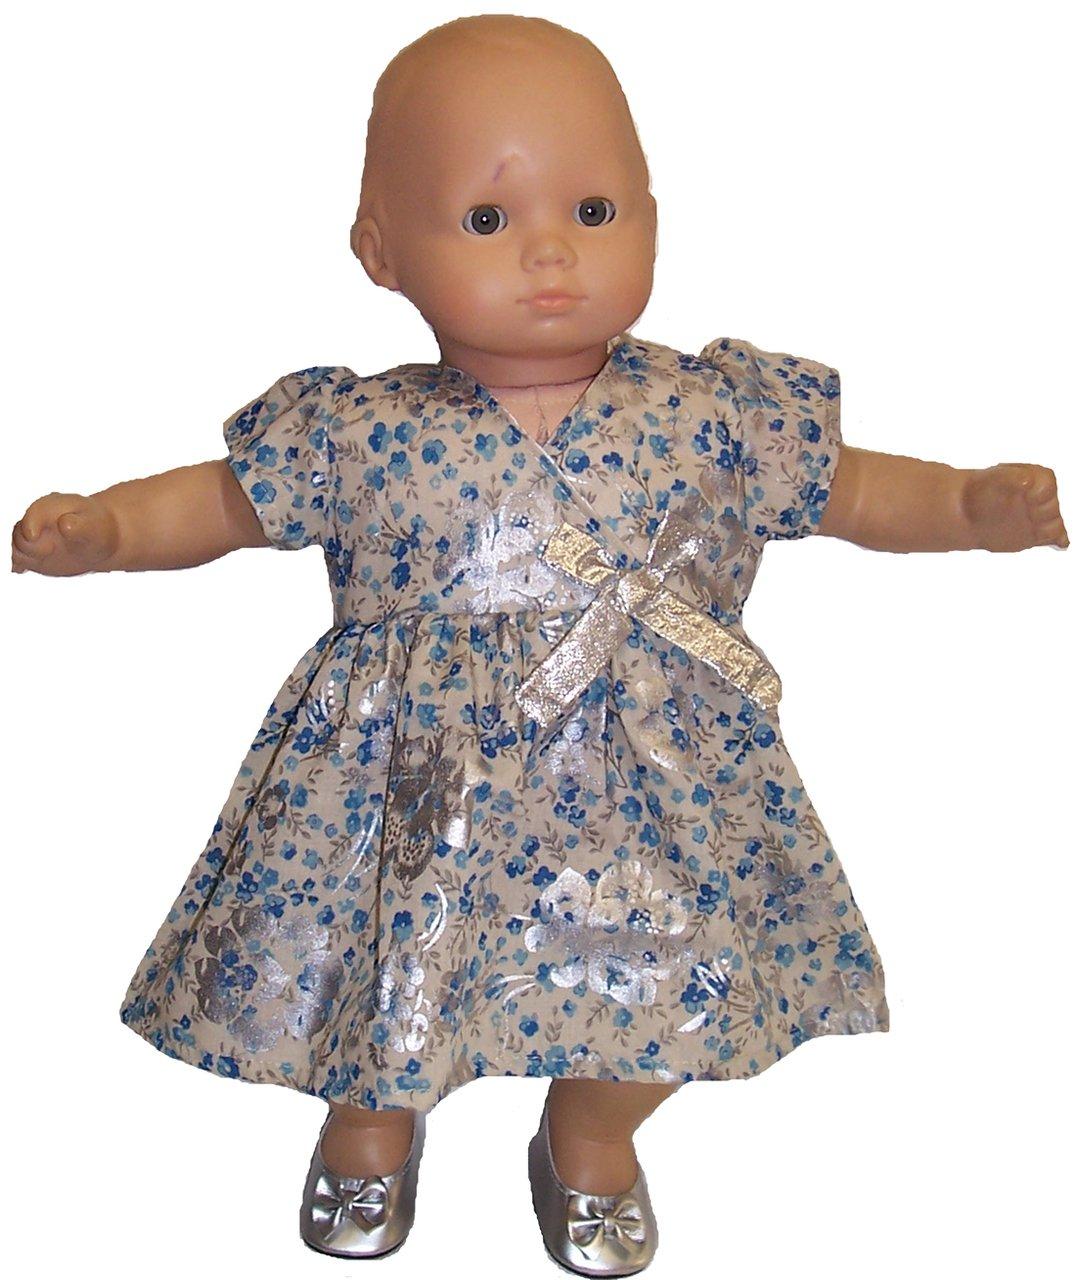 Doll Clothes Clothes Super Super Storeブルーとシルバー花for Baby Dolls Baby B00ZM1SOG4, こだわりのアイタイショップ:2ff6e08c --- arvoreazul.com.br